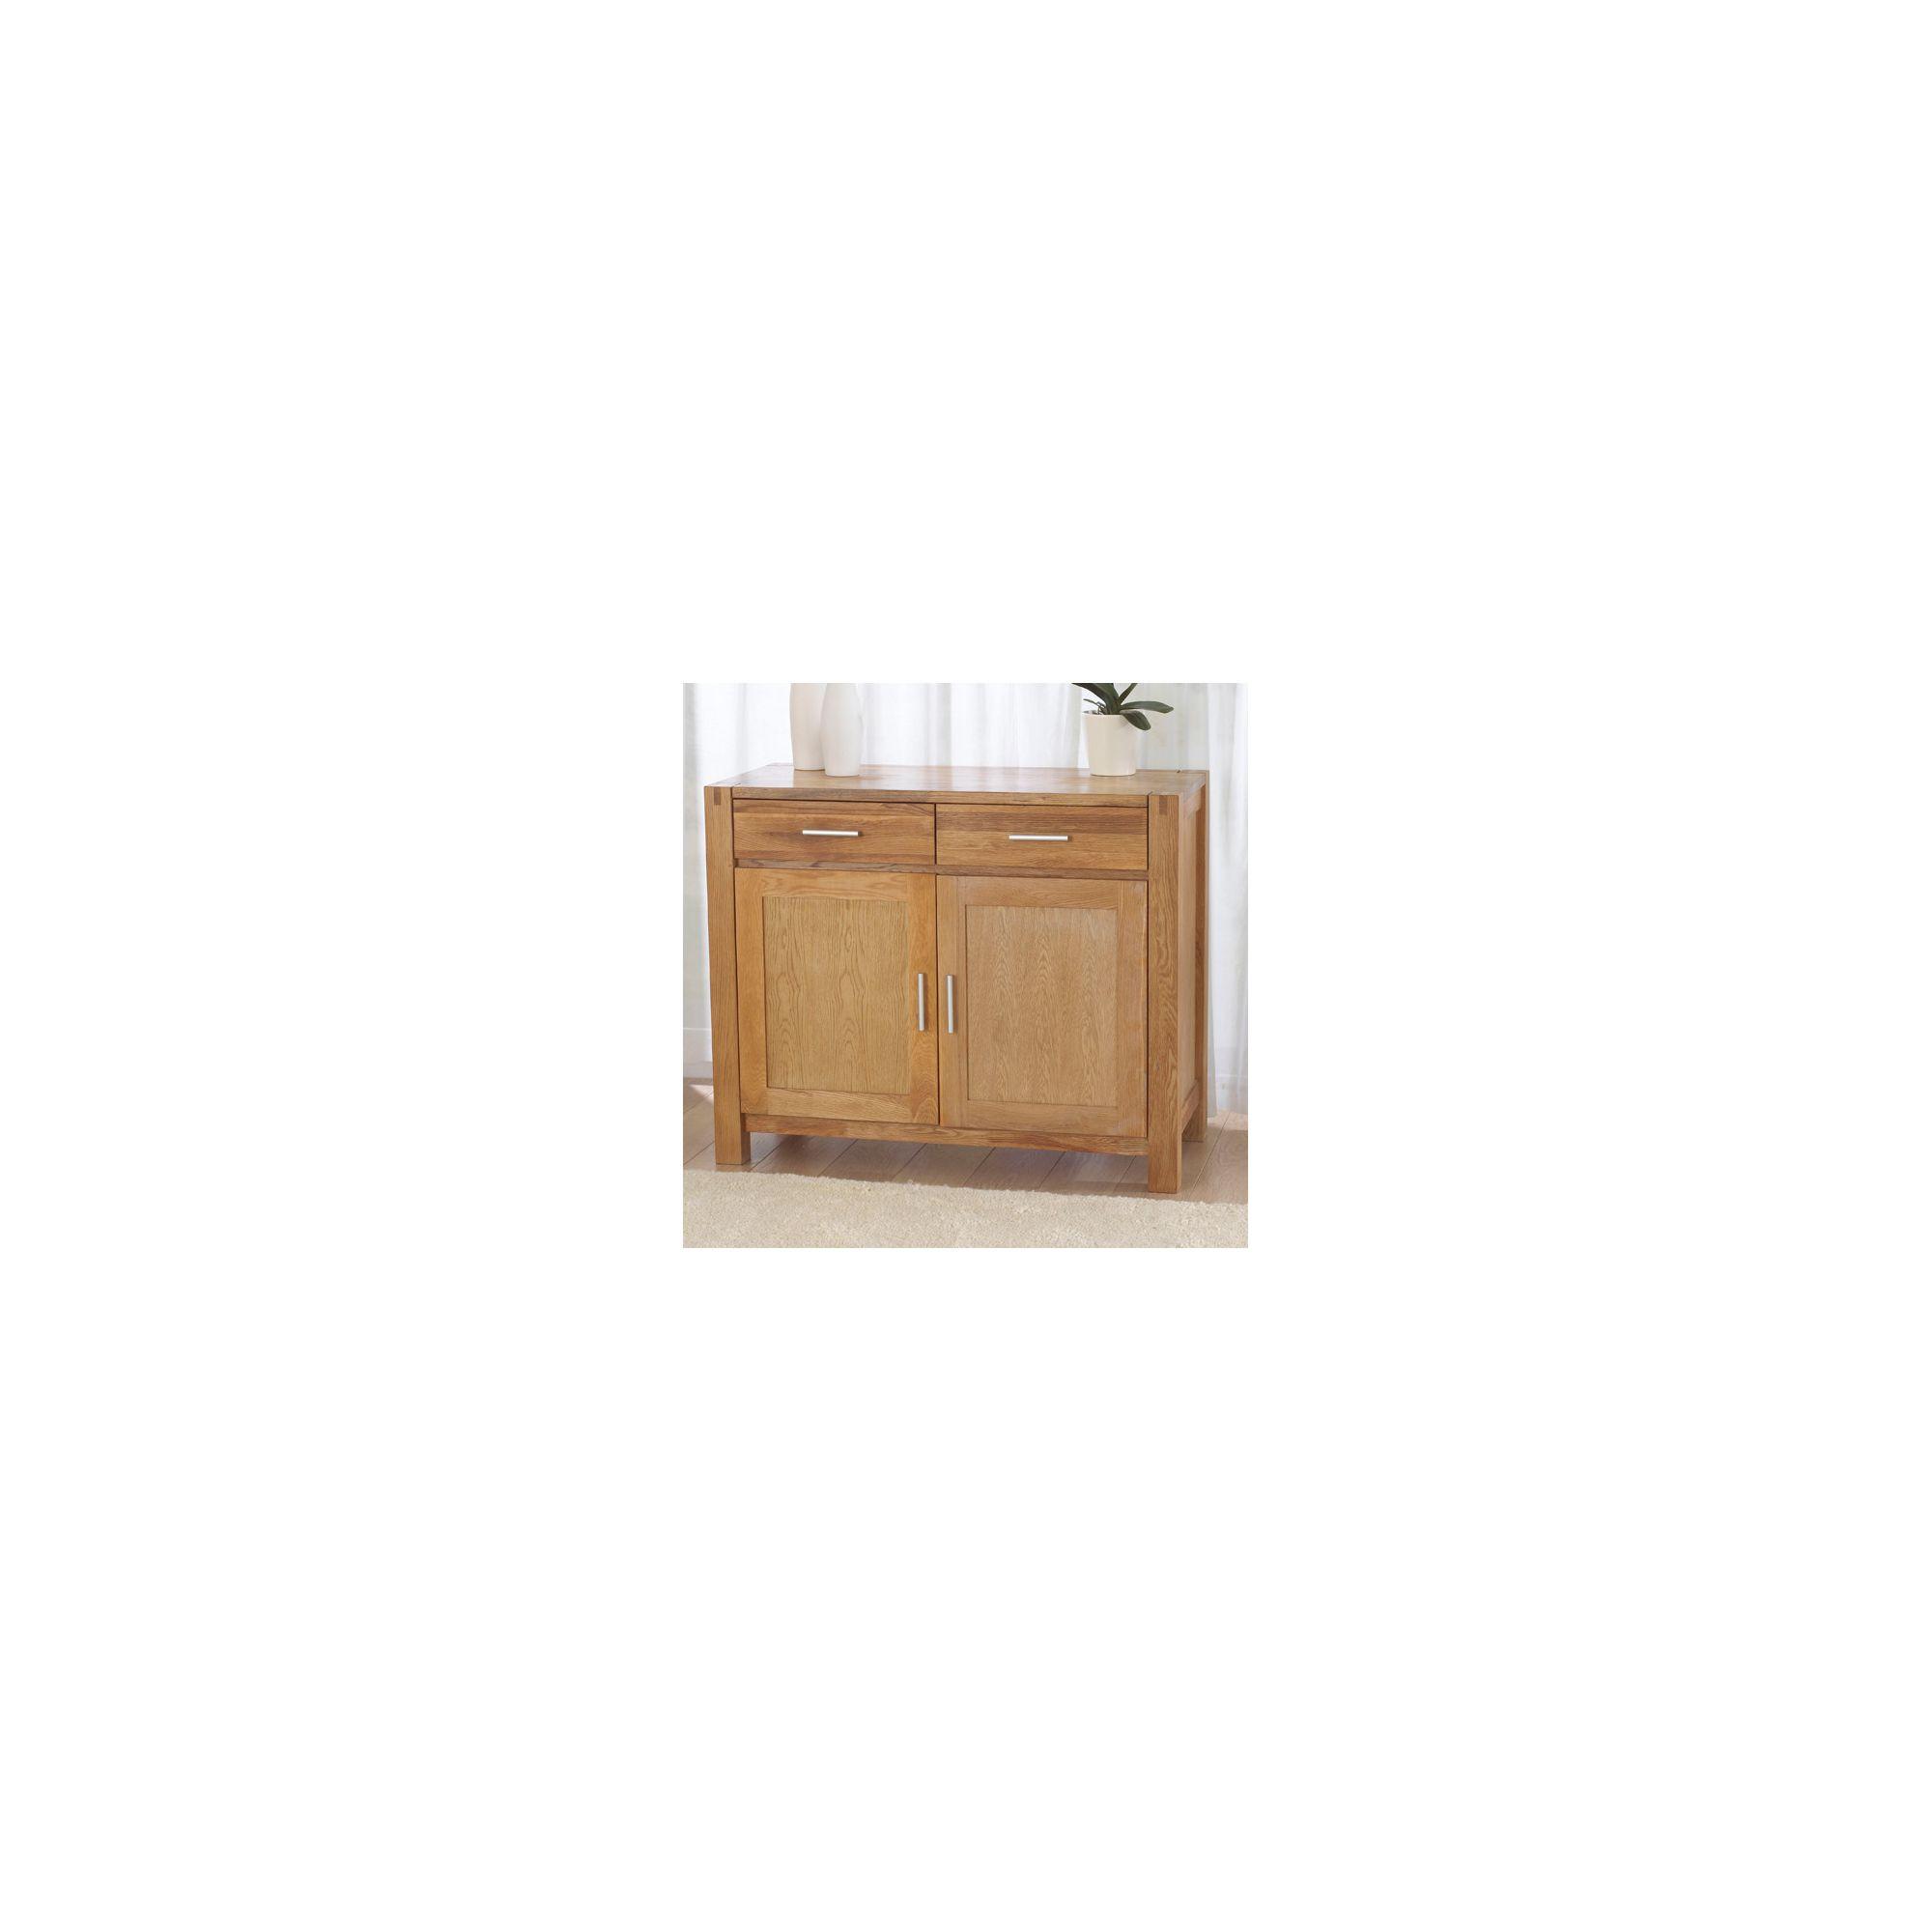 Mark Harris Furniture Verona Oak Sideboard - Extra Large at Tesco Direct